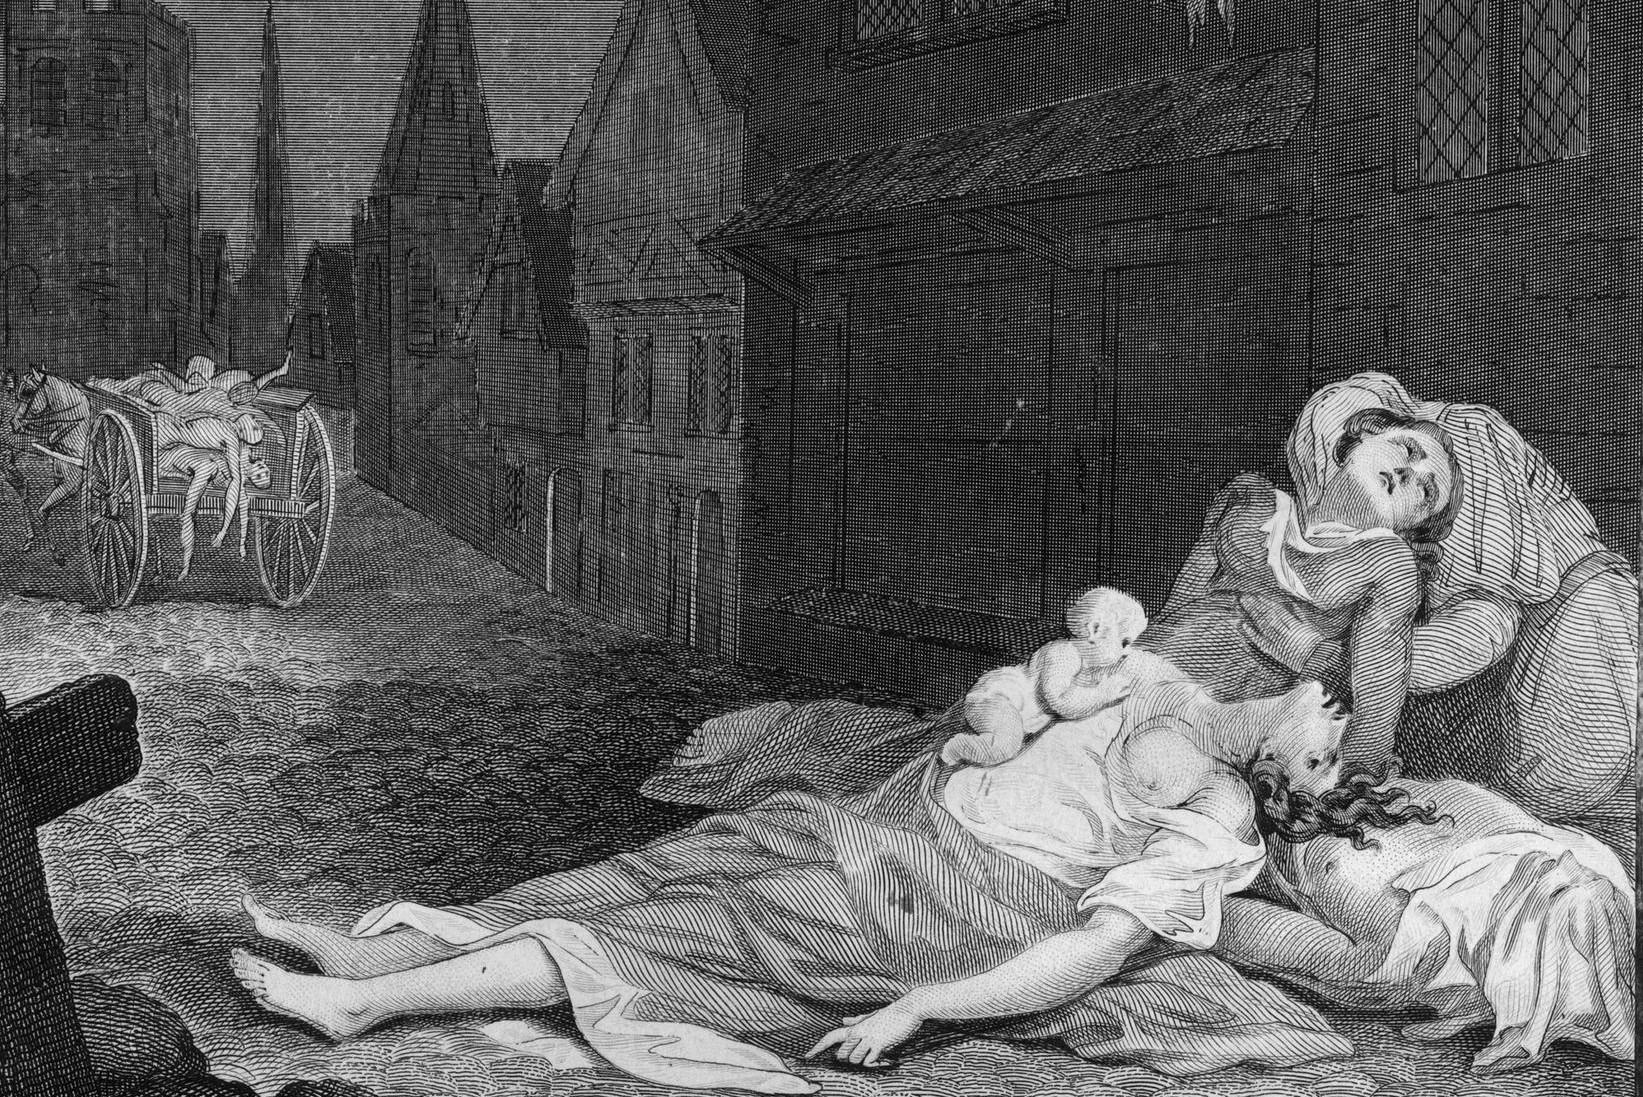 Mrtvi ljudi na ulicama Londona tokom Velike kuge 1665. (Foto: Getty Images)